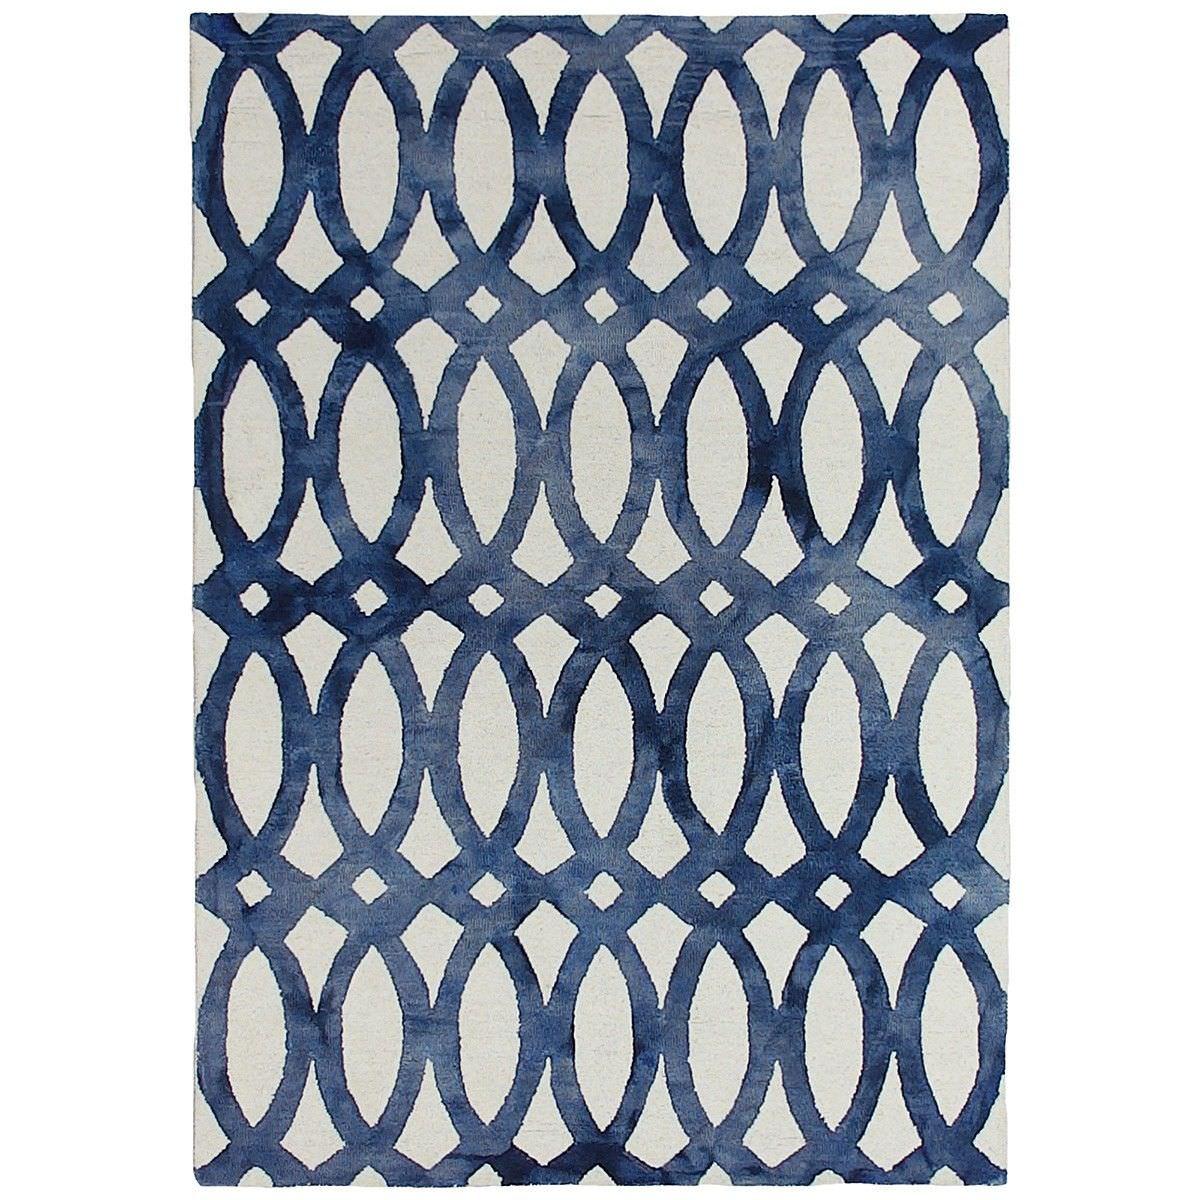 Dip Dye Hand Tufted Wool Rug, 250x300cm, Navy